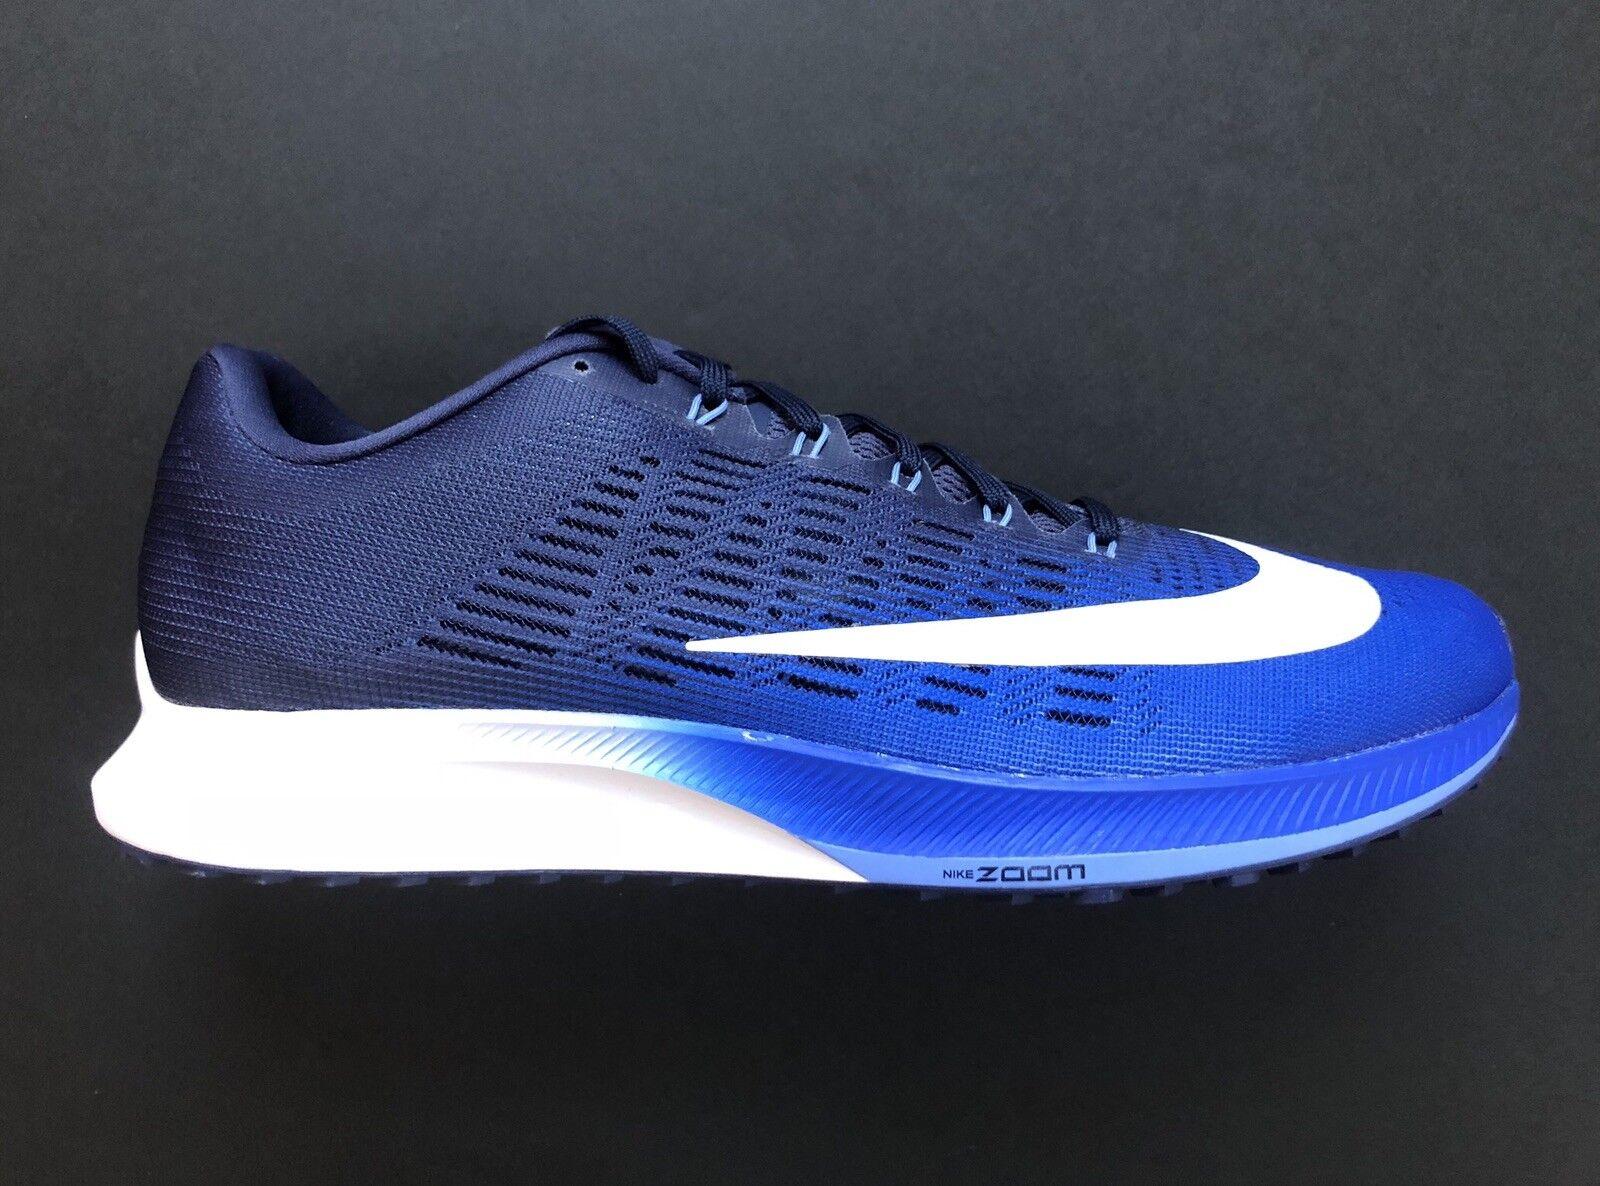 Nike Air Zoom Elite Hyper Royal Royal Royal White Running shoes 863769-406 Size 12 b42c4a